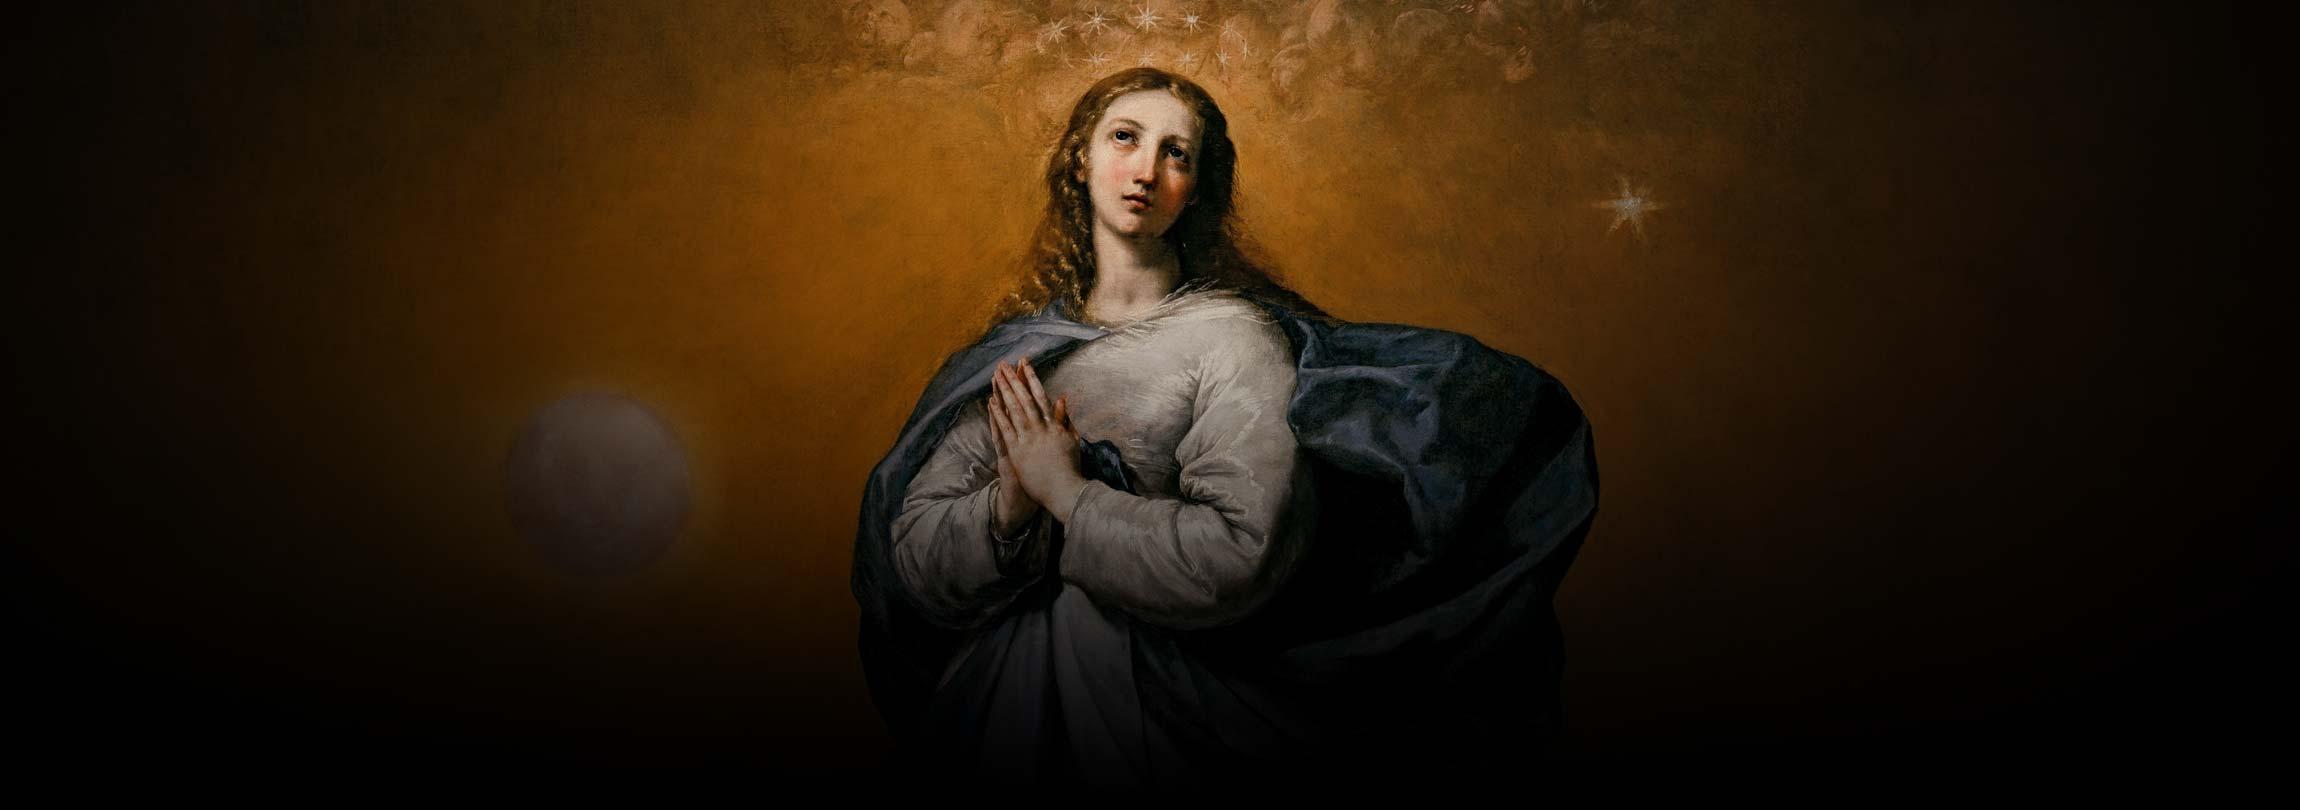 Por que é importante a virgindade perpétua de Maria?